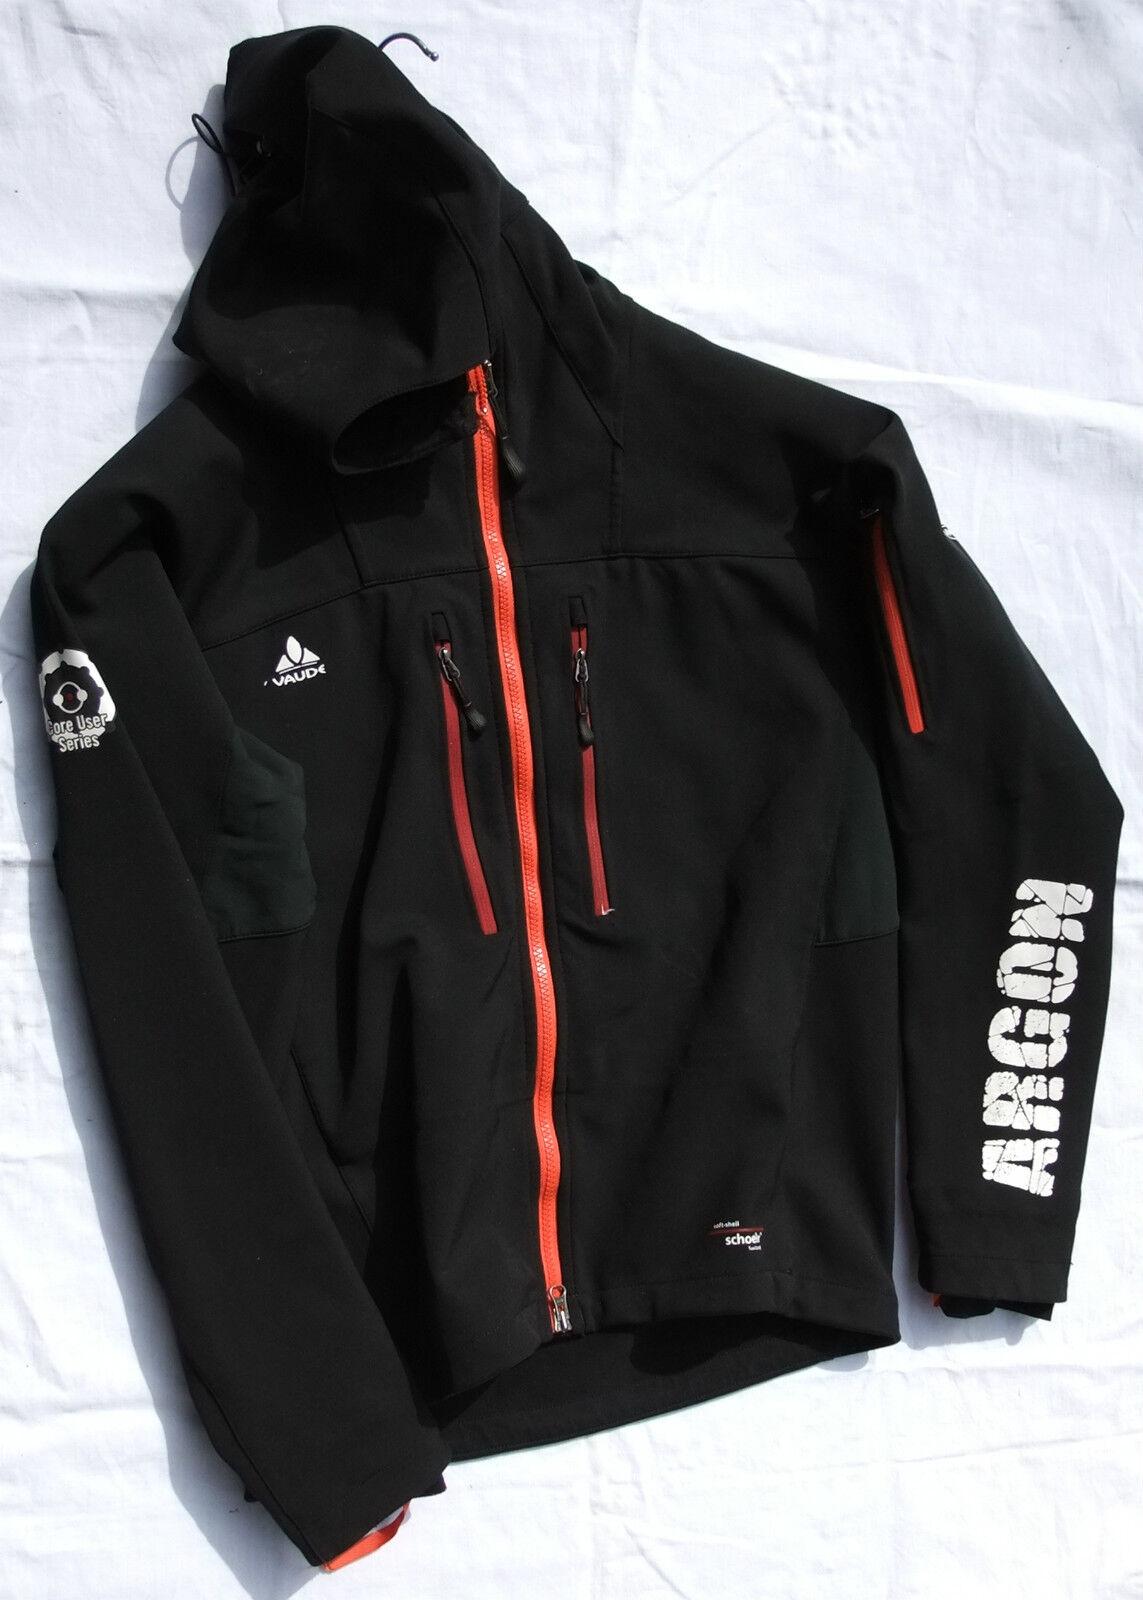 Vaude Softshell-chaqueta  argón , negro talla m